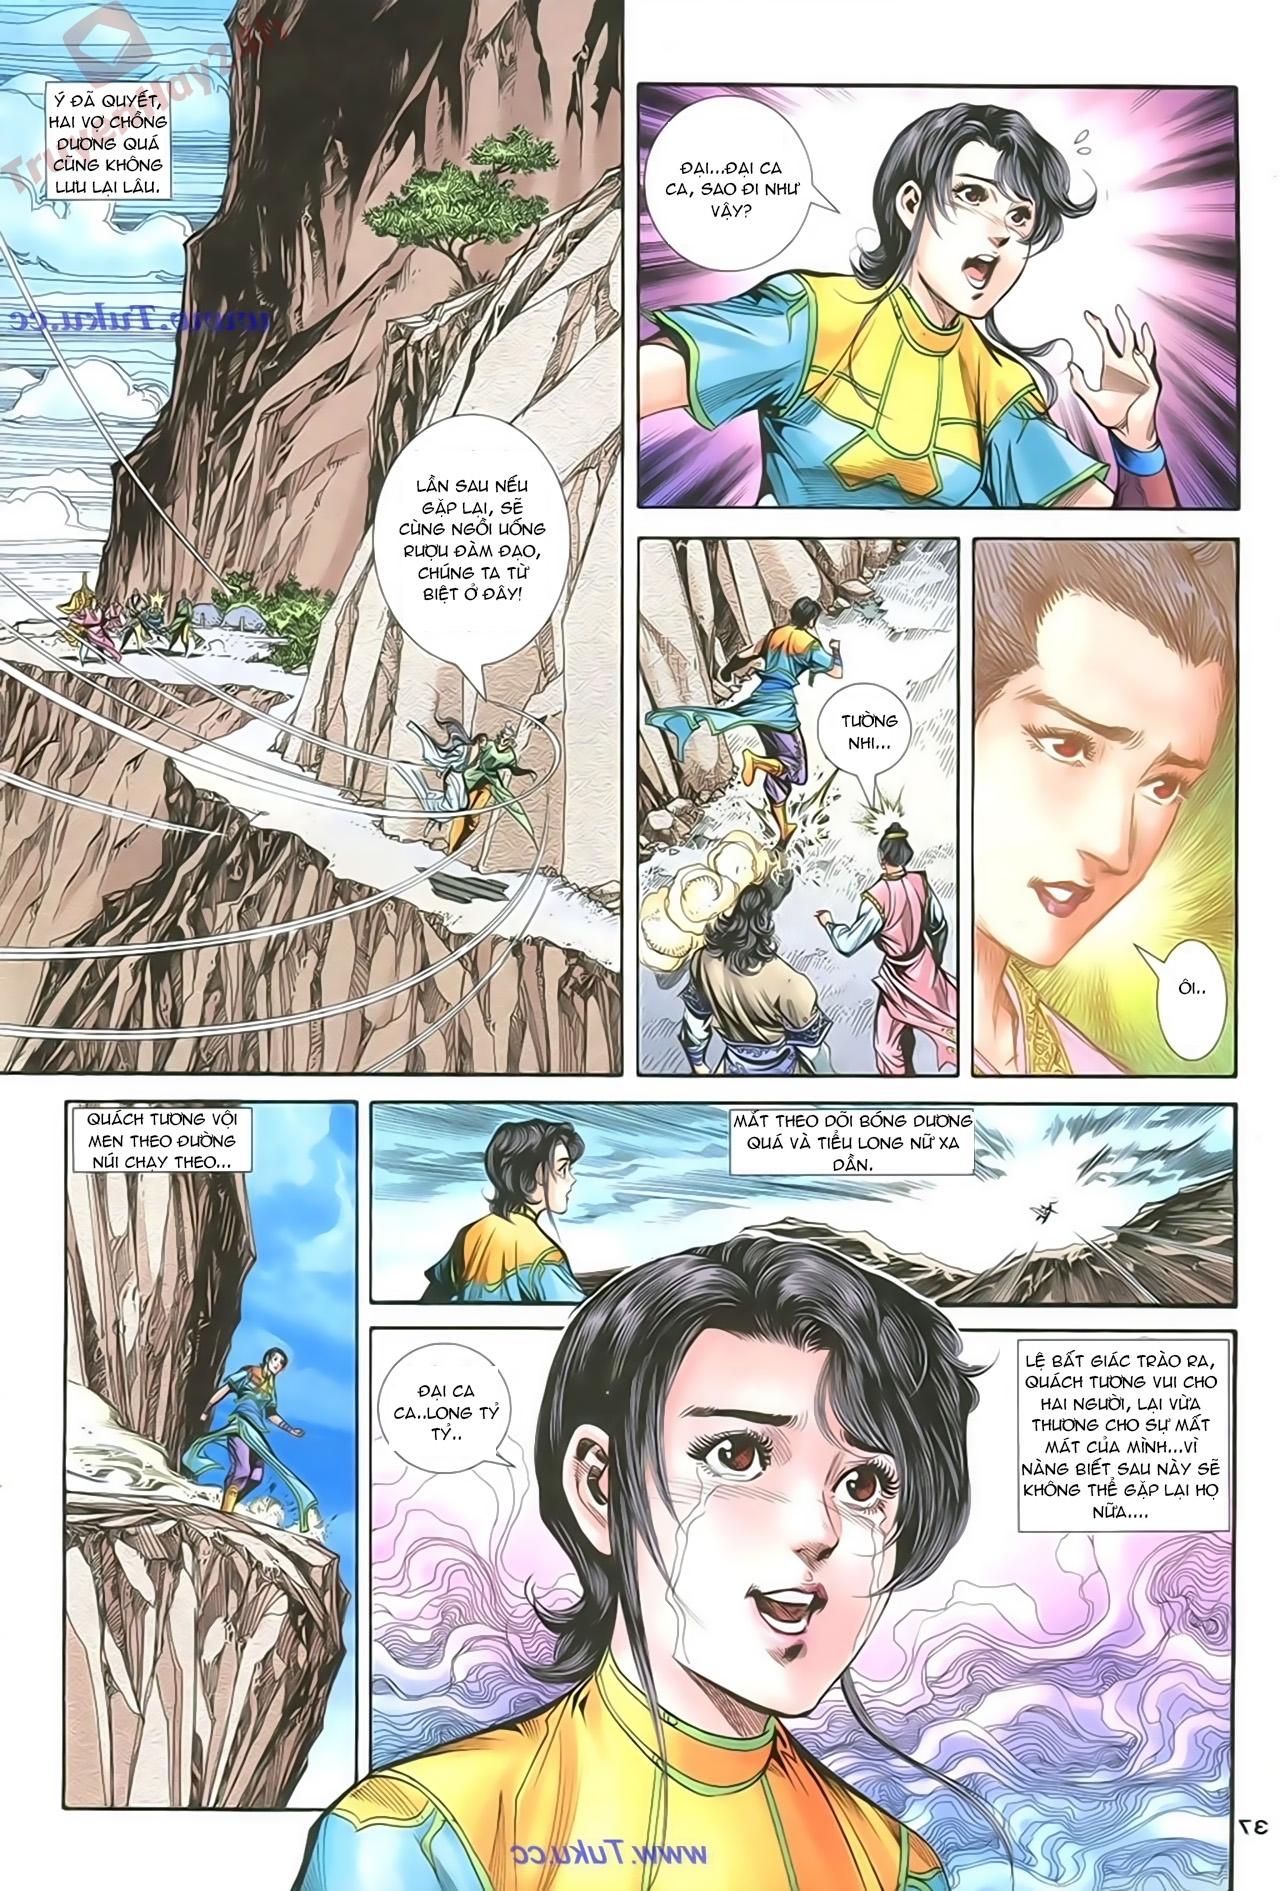 Thần Điêu Hiệp Lữ chap 86 – End Trang 36 - Mangak.info